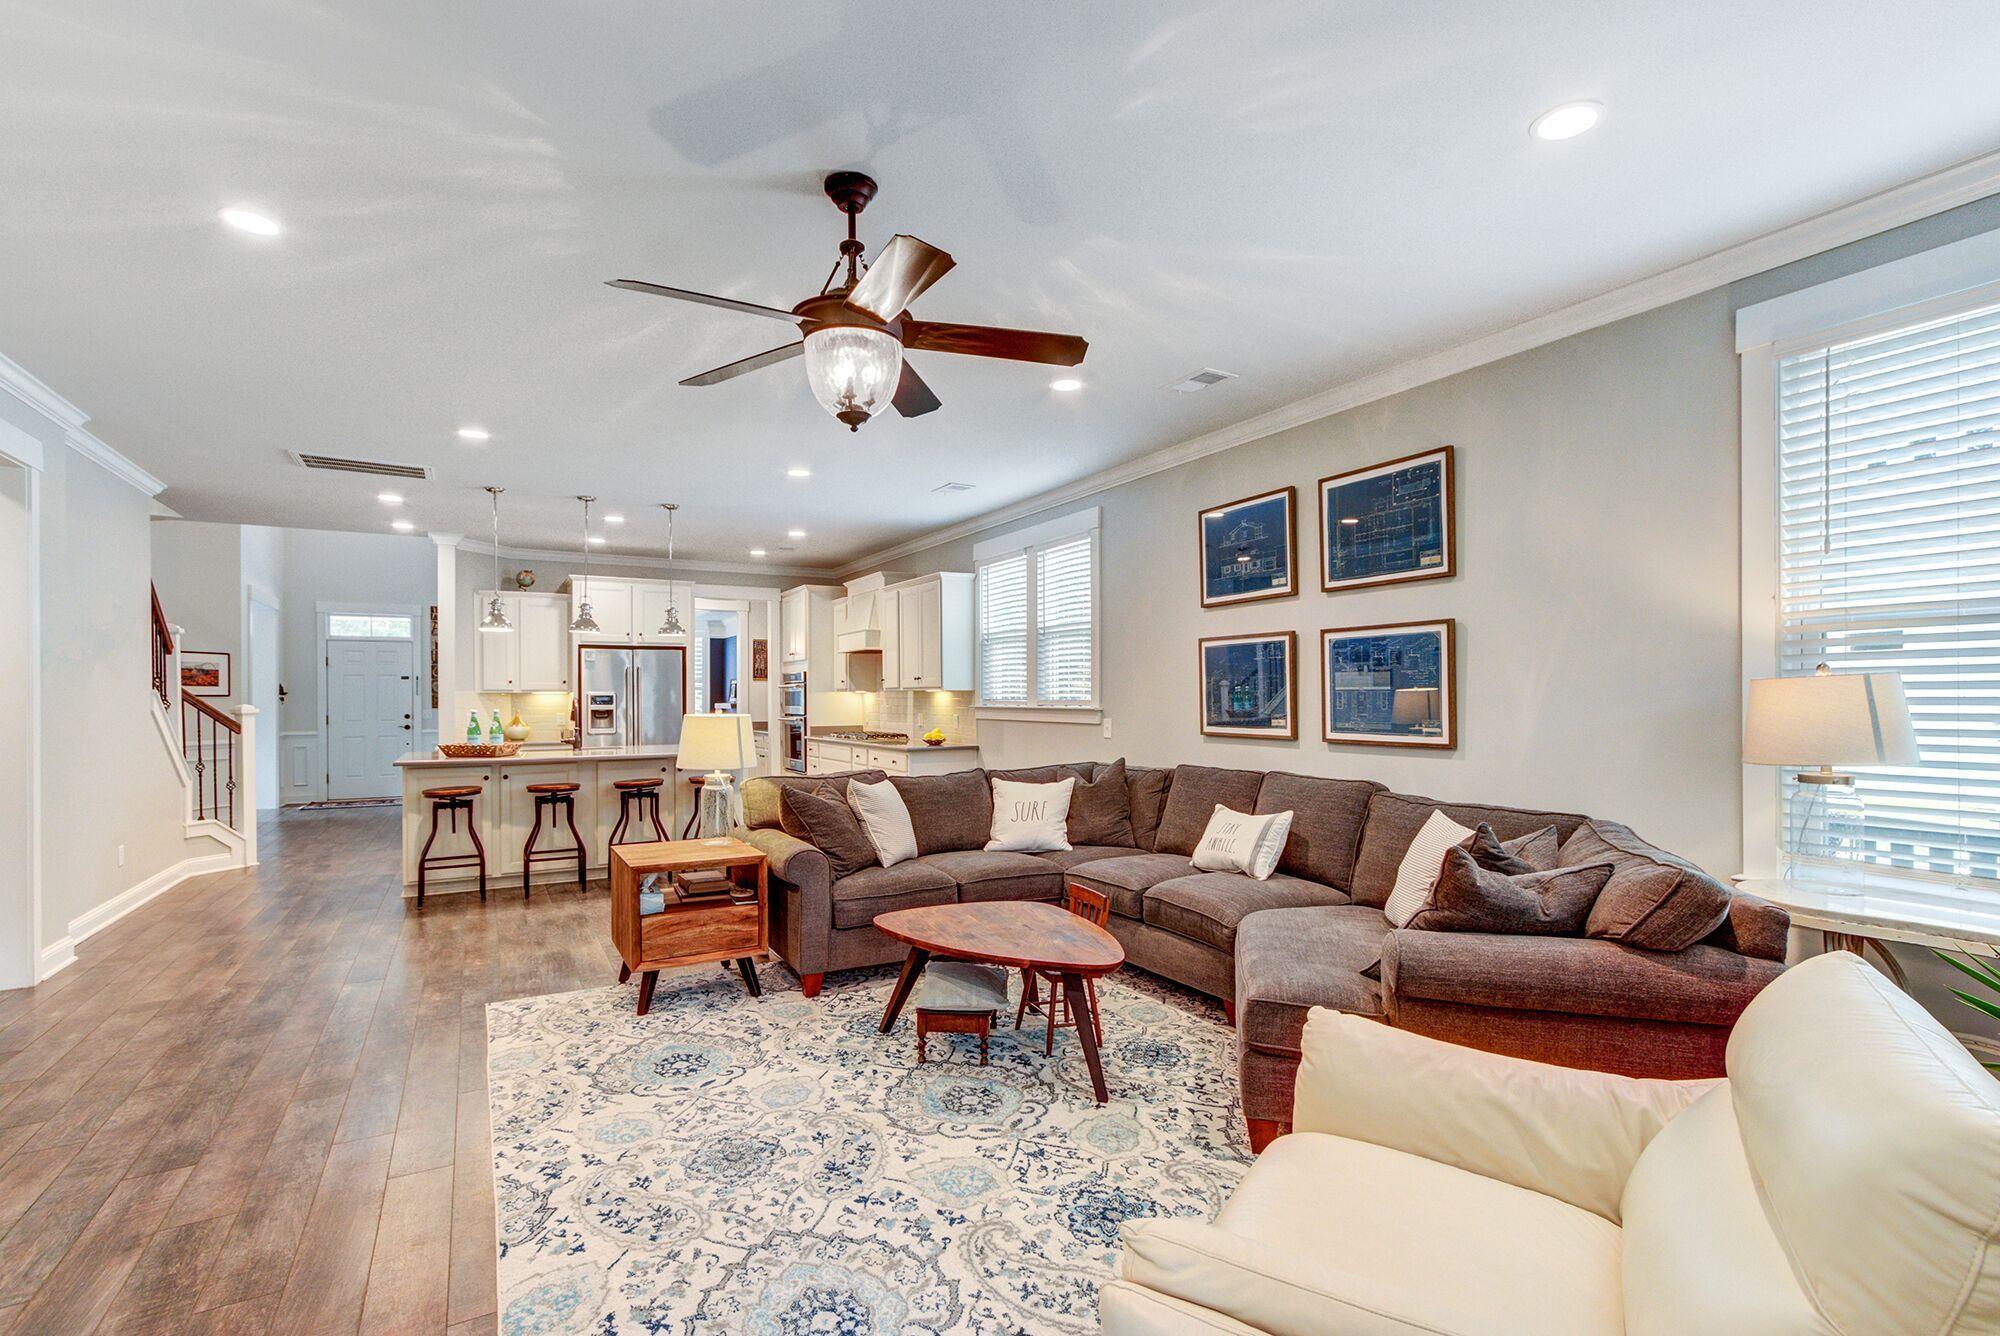 Carolina Bay Homes For Sale - 2739 Rutherford, Charleston, SC - 8